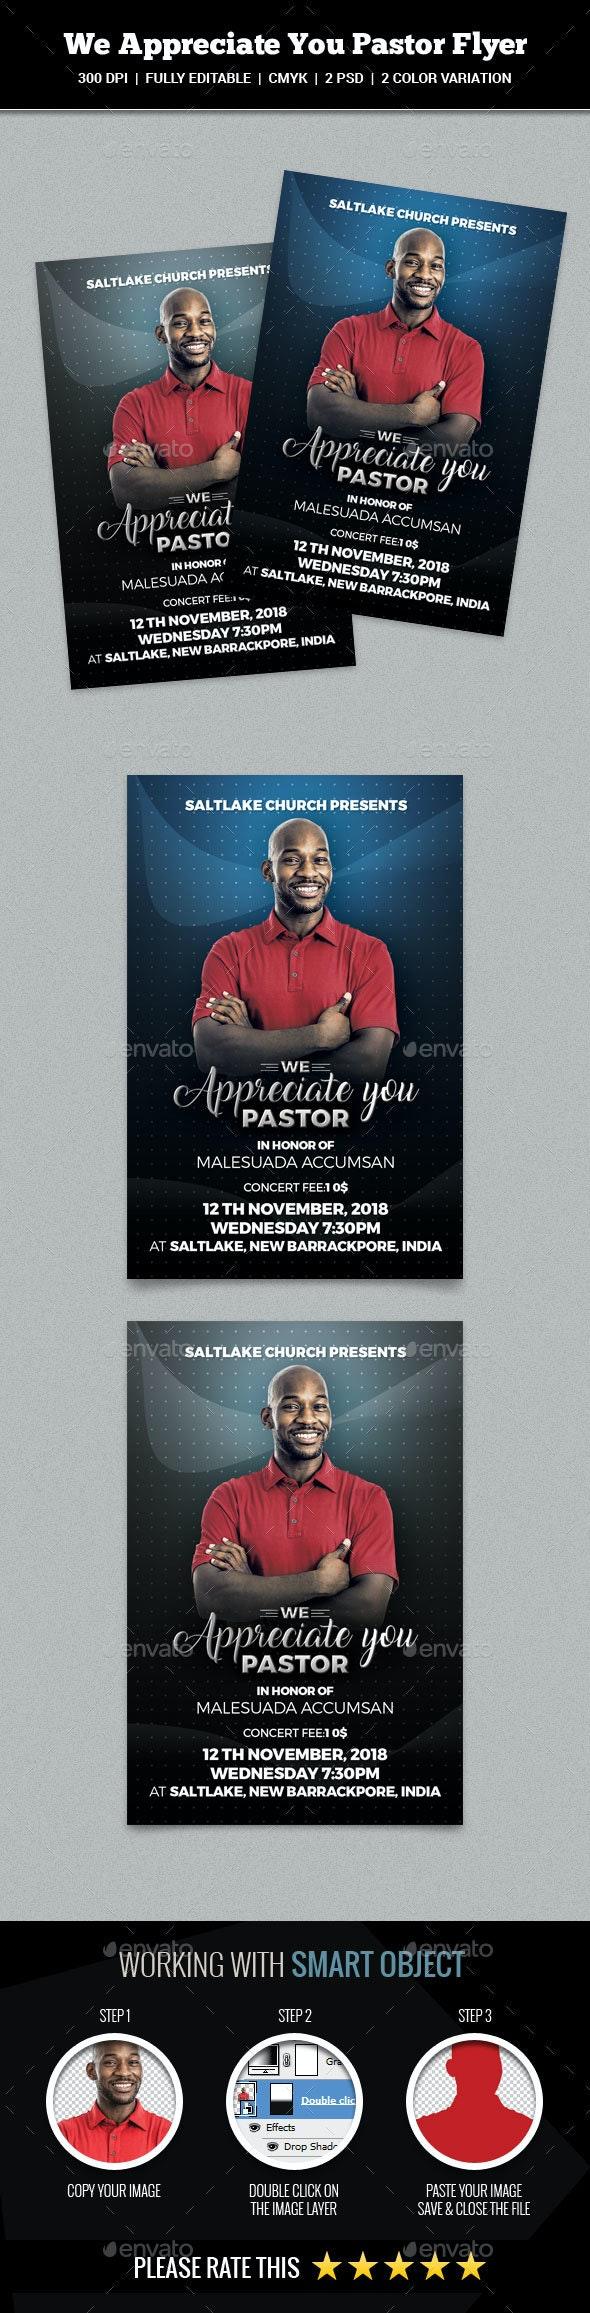 We Appreciate You Pastor Flyer - Church Flyers